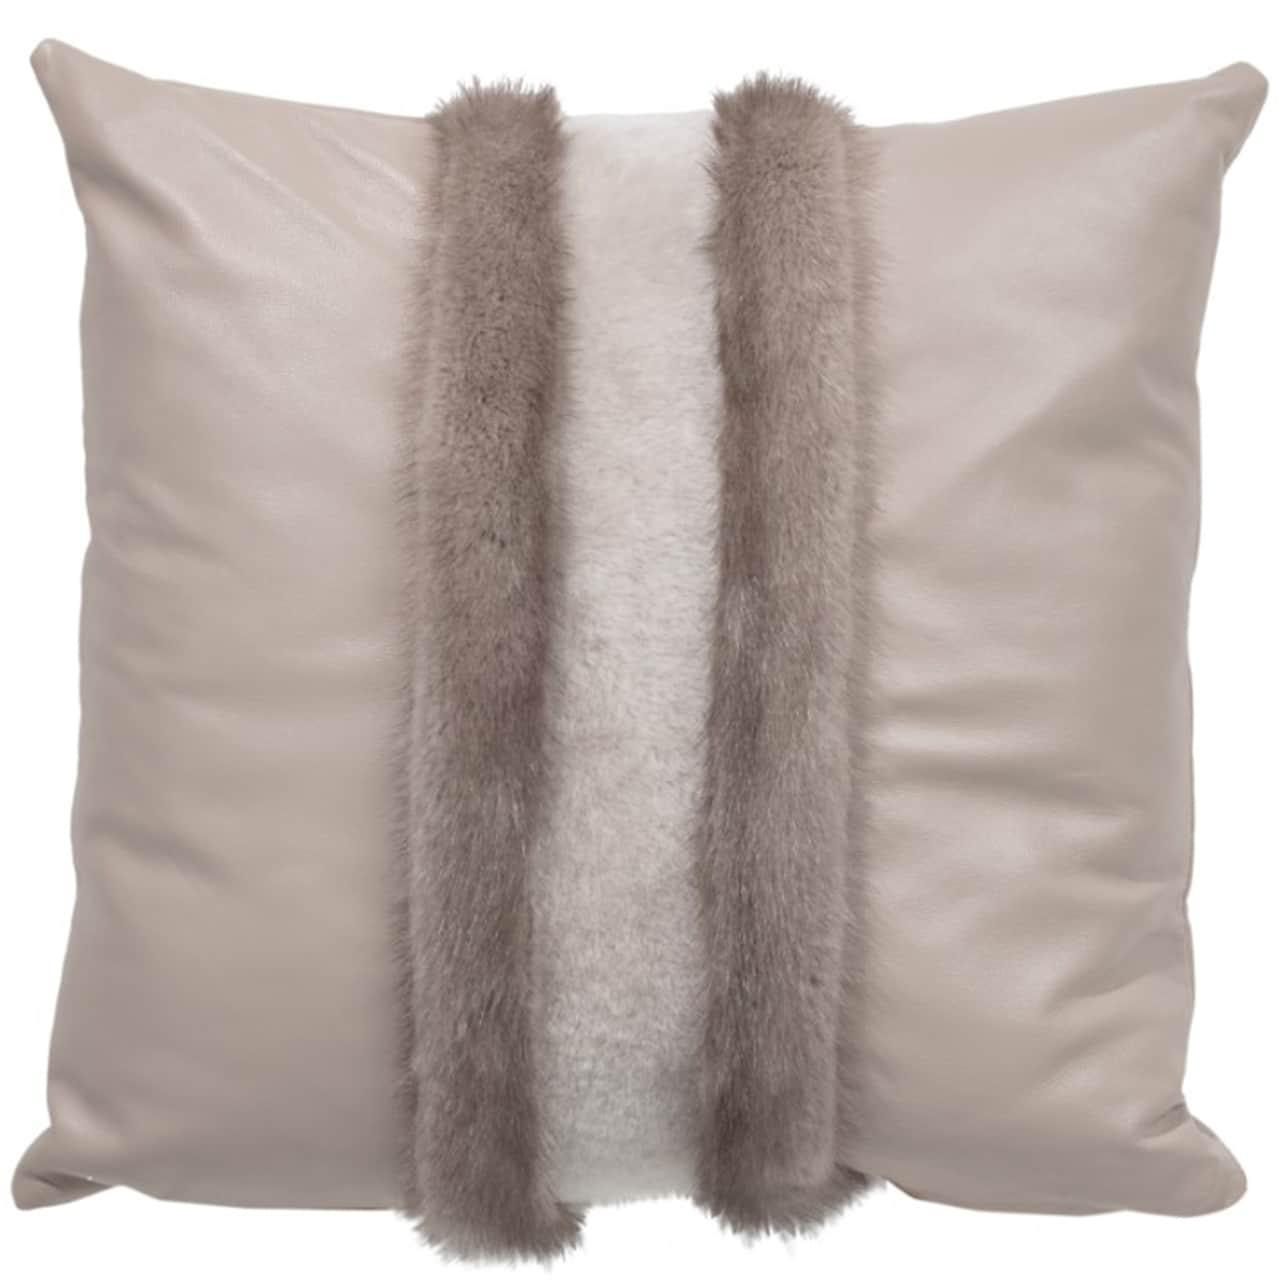 NEW-Mink Pillow- Silver V. 50x50cm (VPLGBSIFD5050) - ANVOGG FEEL SHEARLING | ANVOGG